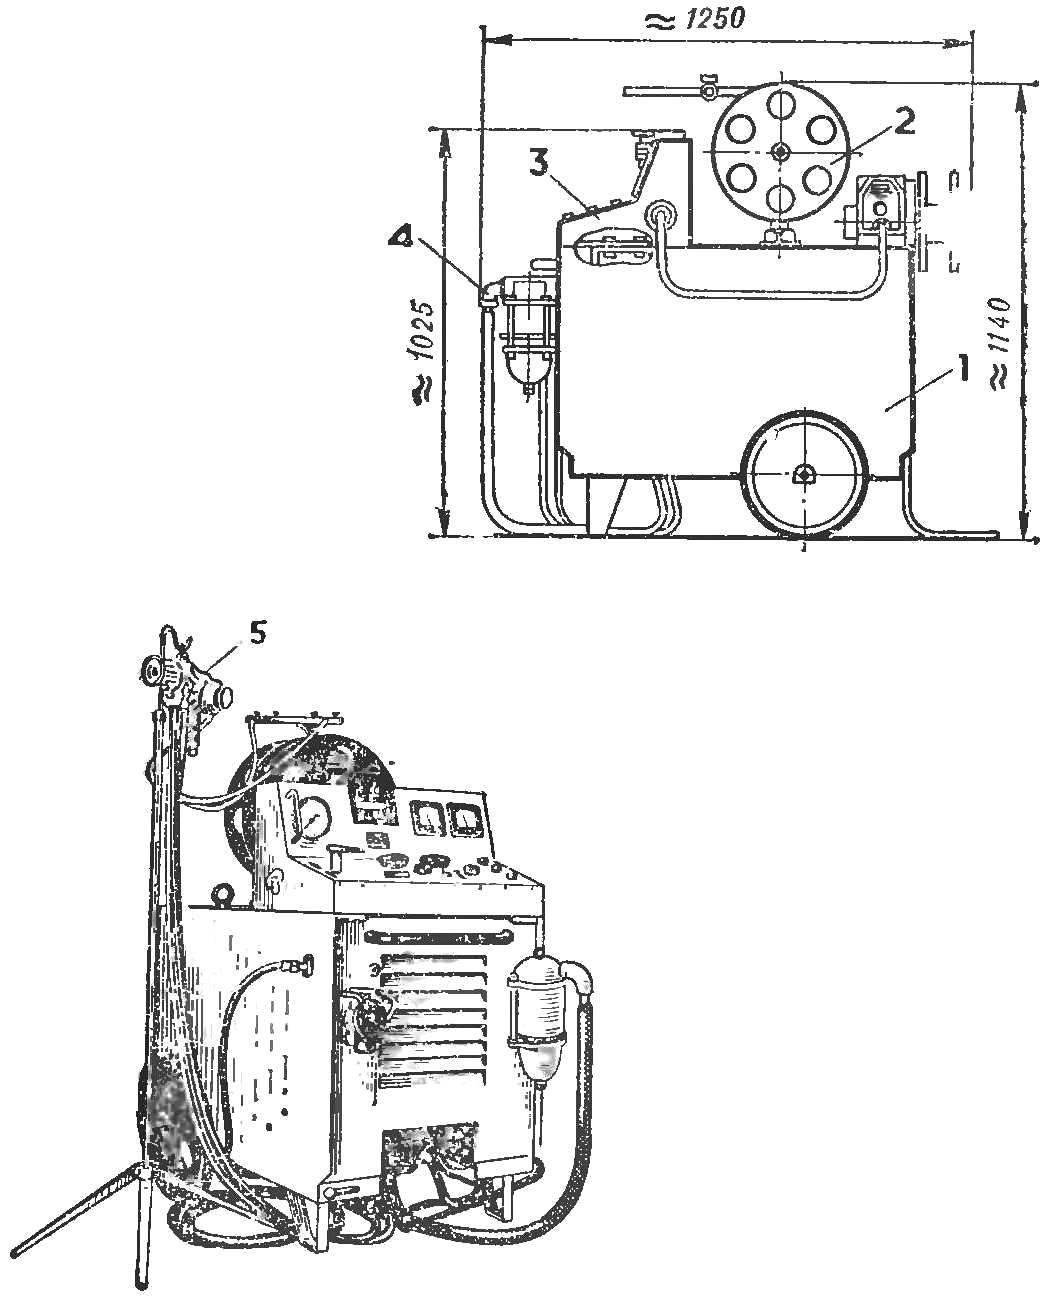 Рис. 1. Аппаратура для металлизации и ее схема